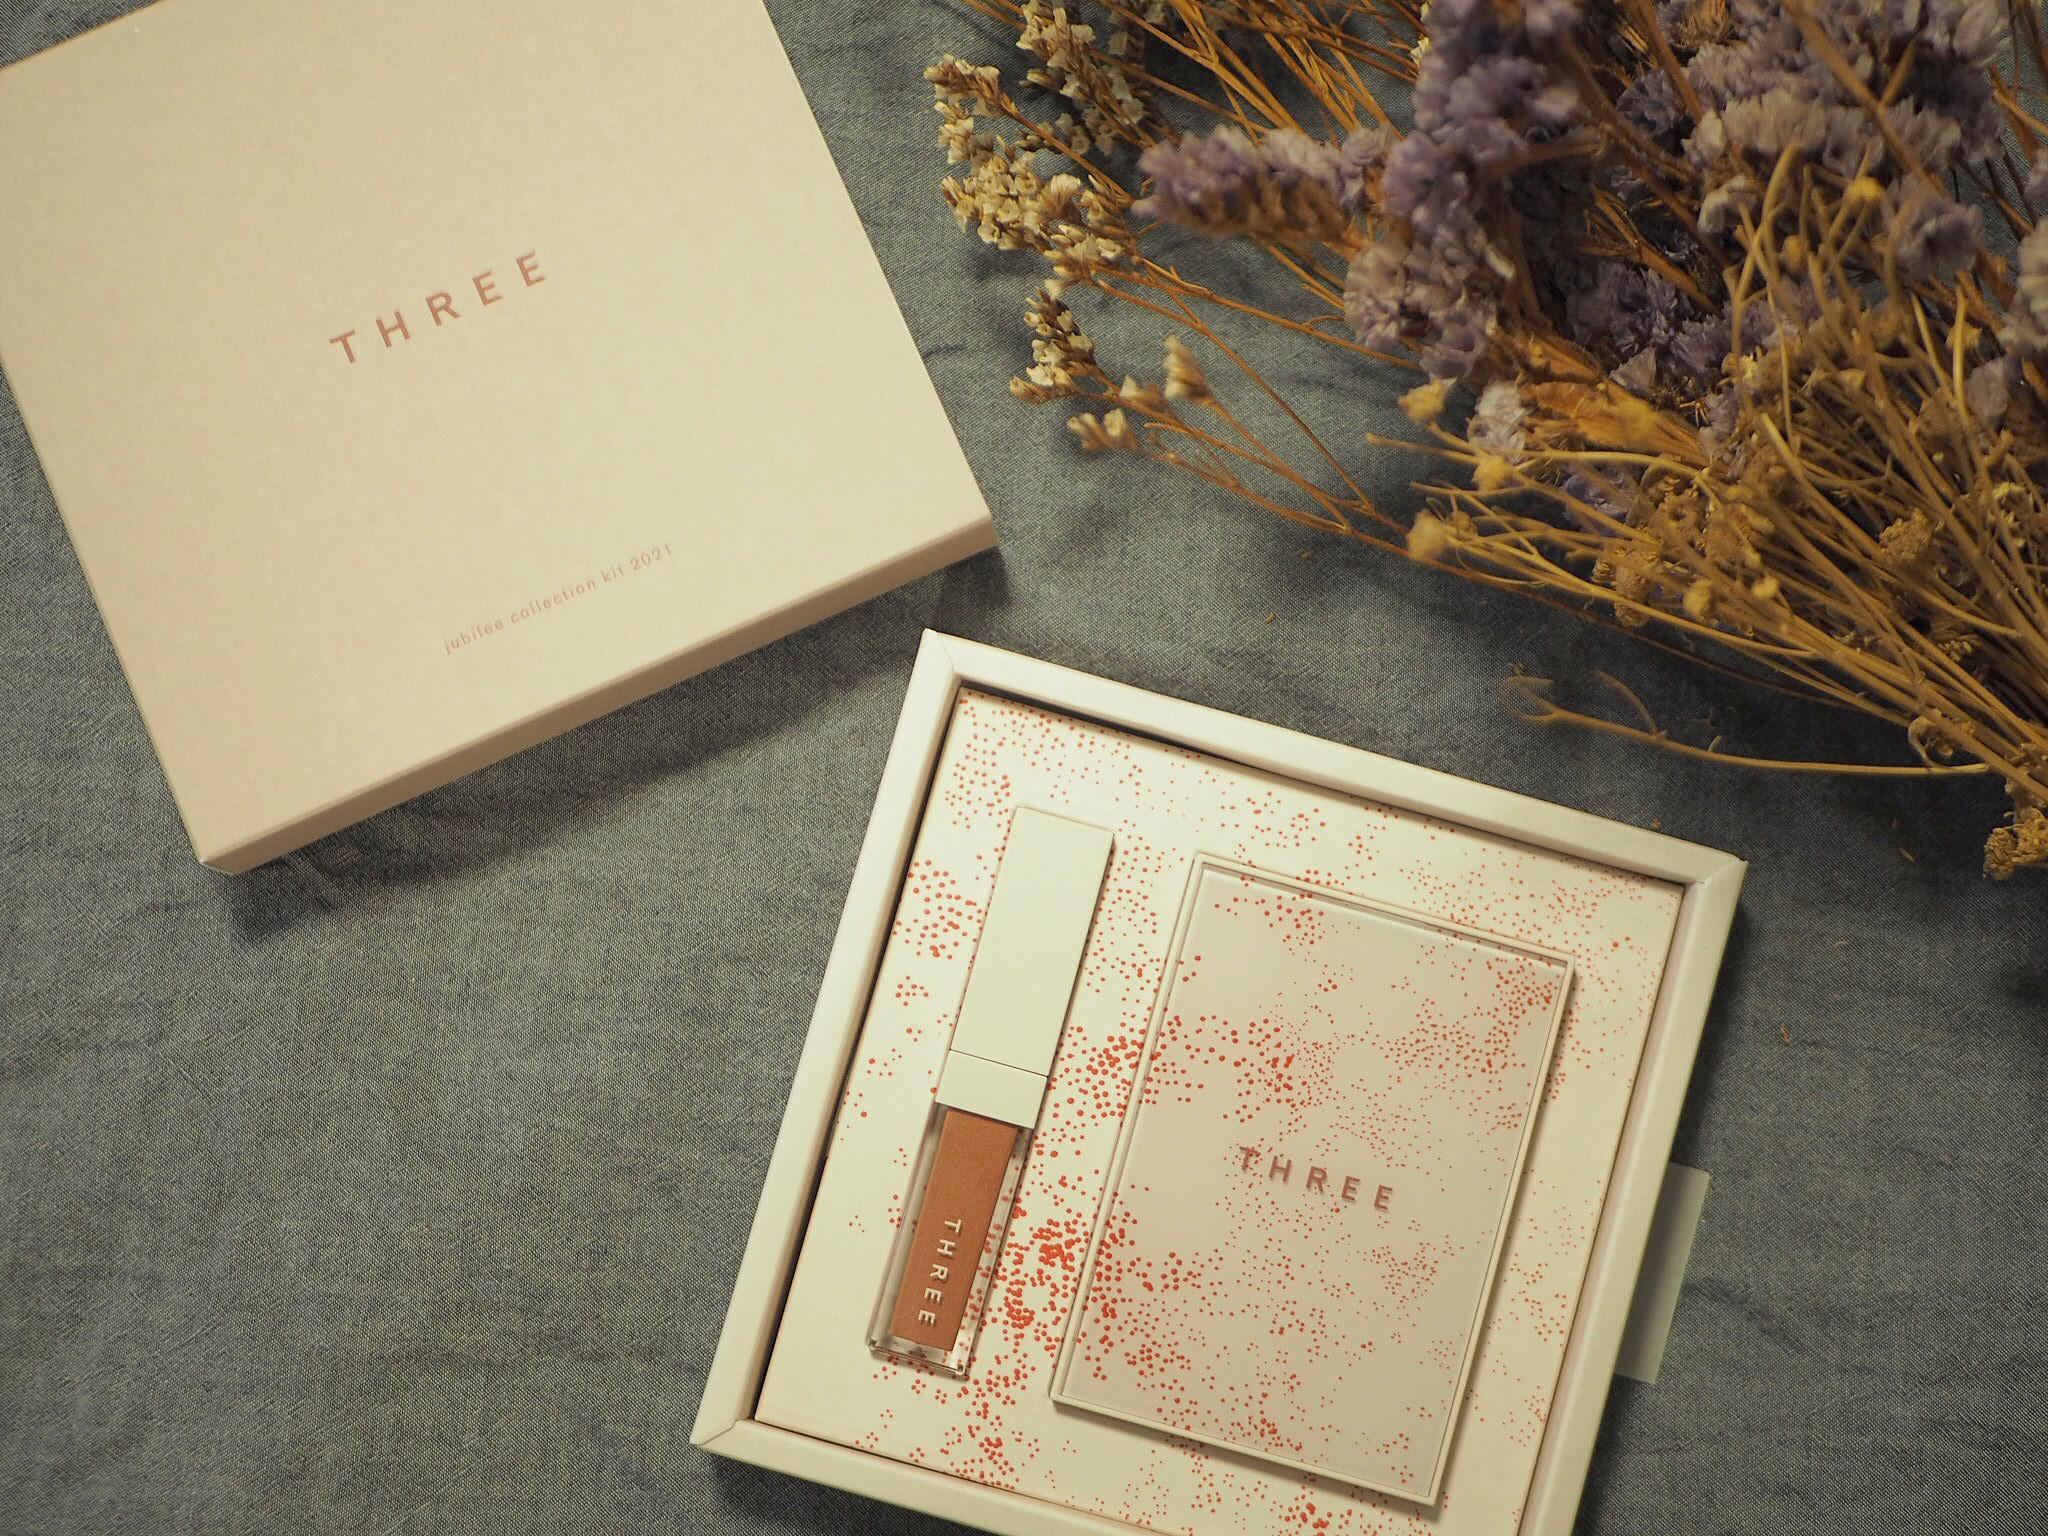 【THREE】「春の赤ときらめき」を楽しめるアイカラー&リップ限定パレットキットが素敵!_3